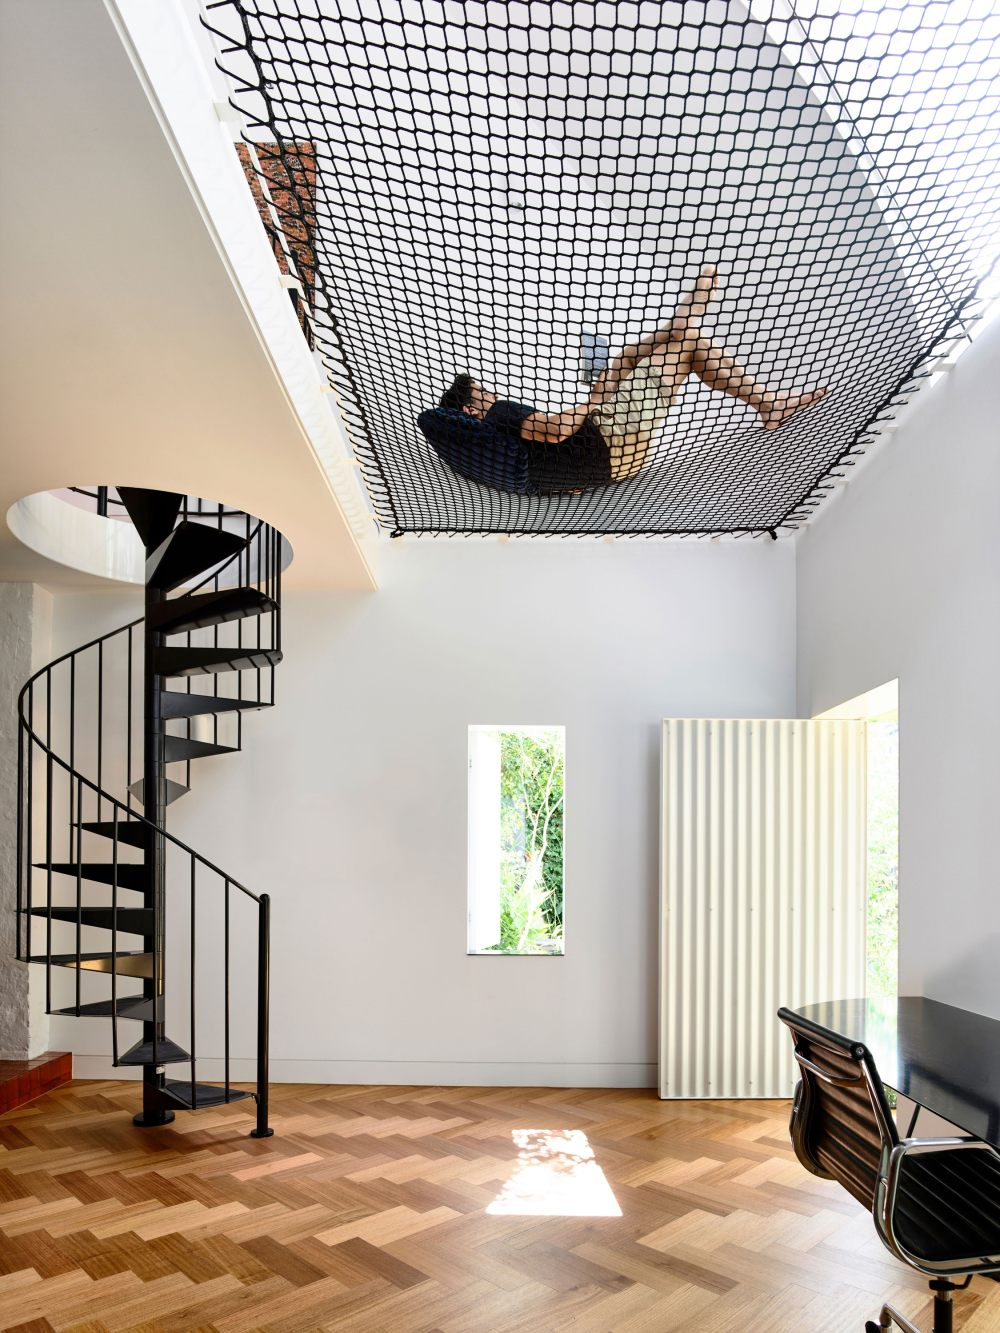 austin_maynard_architects_derek_swalwell_king_bill11.jpg